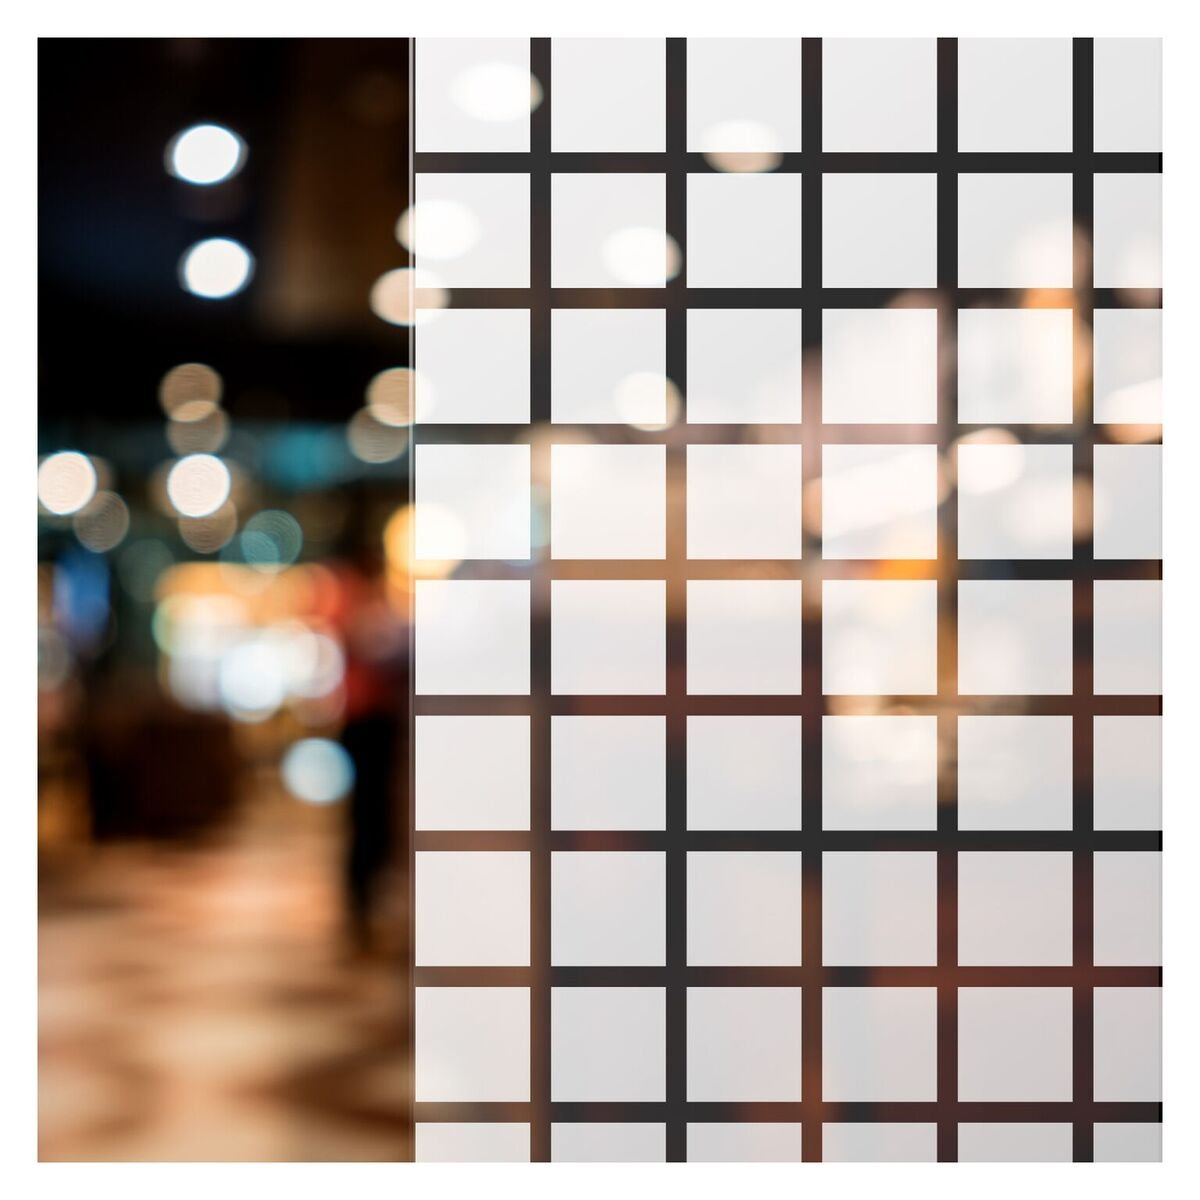 BdF BBLウィンドウフィルム太字ブロック装飾( 1 3 / 8インチホワイト正方形) 12